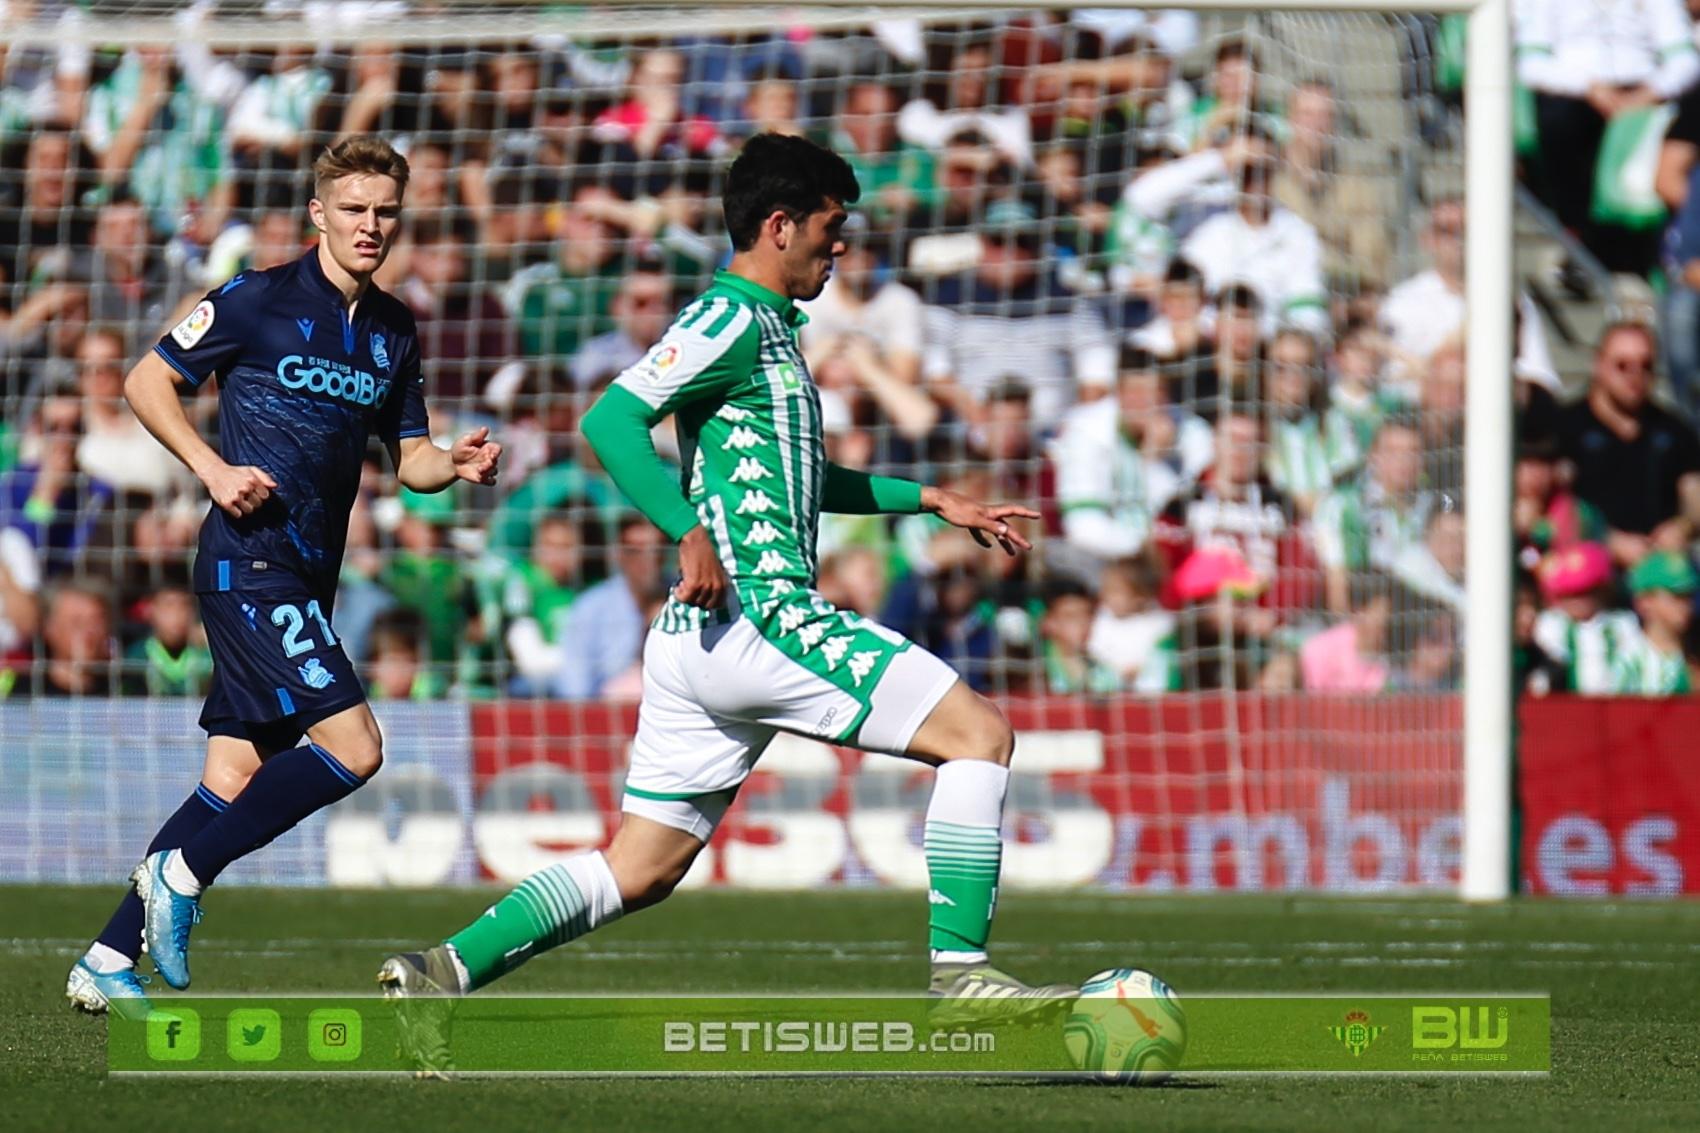 J20 Real Betis - Real Sociedad 7